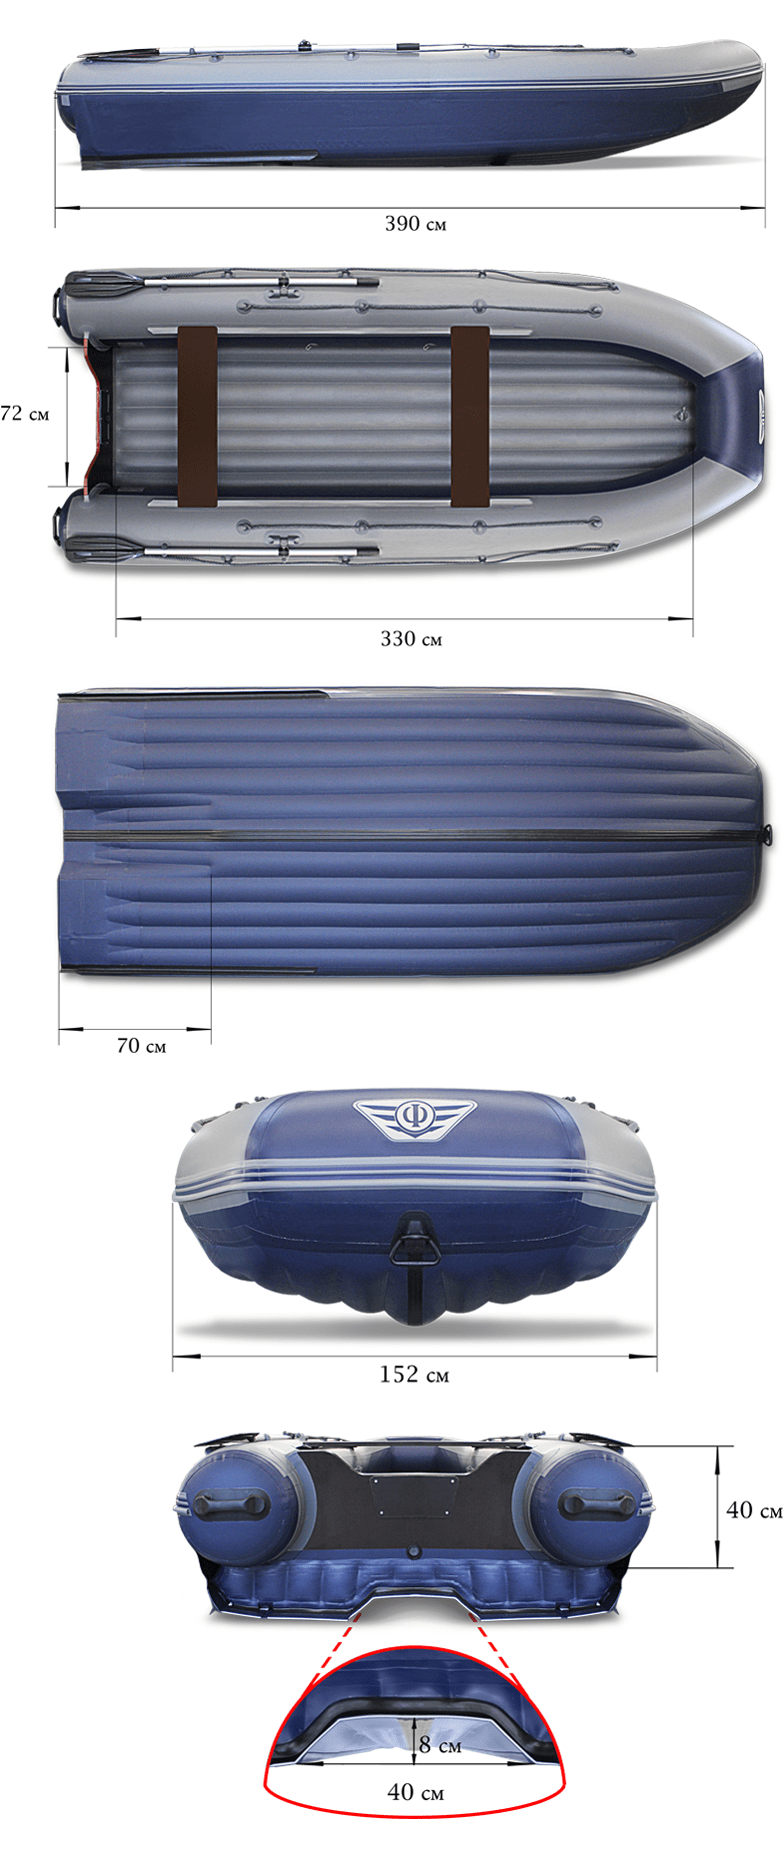 ФЛАГМАН DK 390i Jet